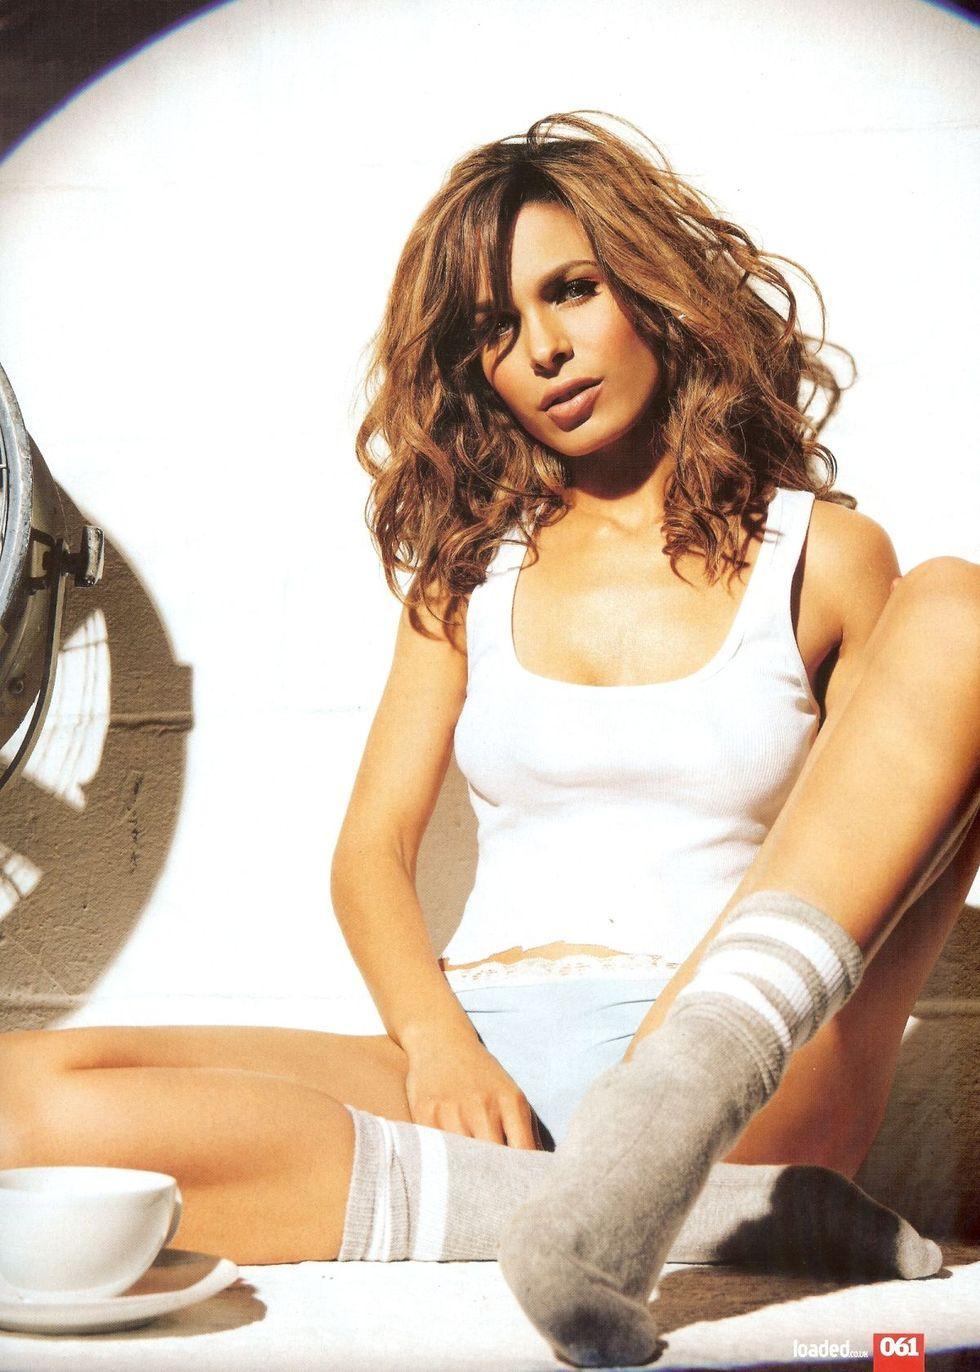 nadine-velazquez-loaded-magazine-december-2008-01